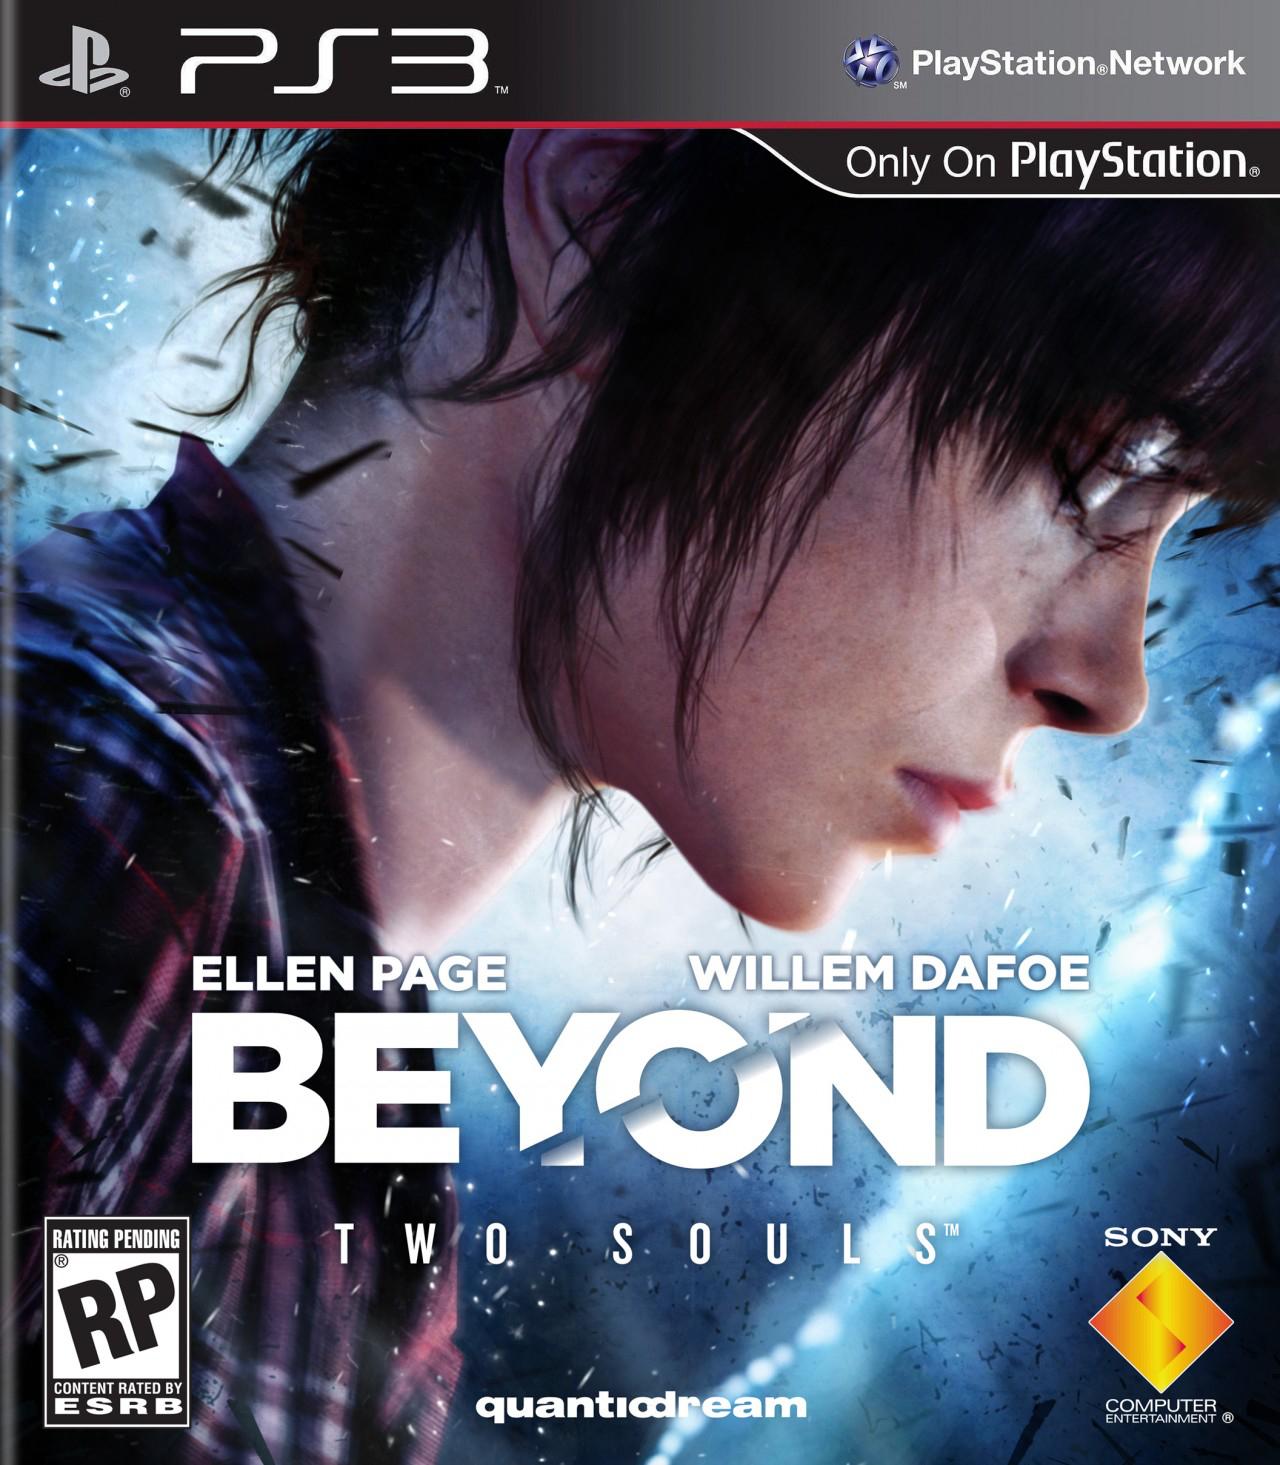 Tomb Raider GOTY sur PS3/XBOX 360 à 15.7€, Beyond Two Souls